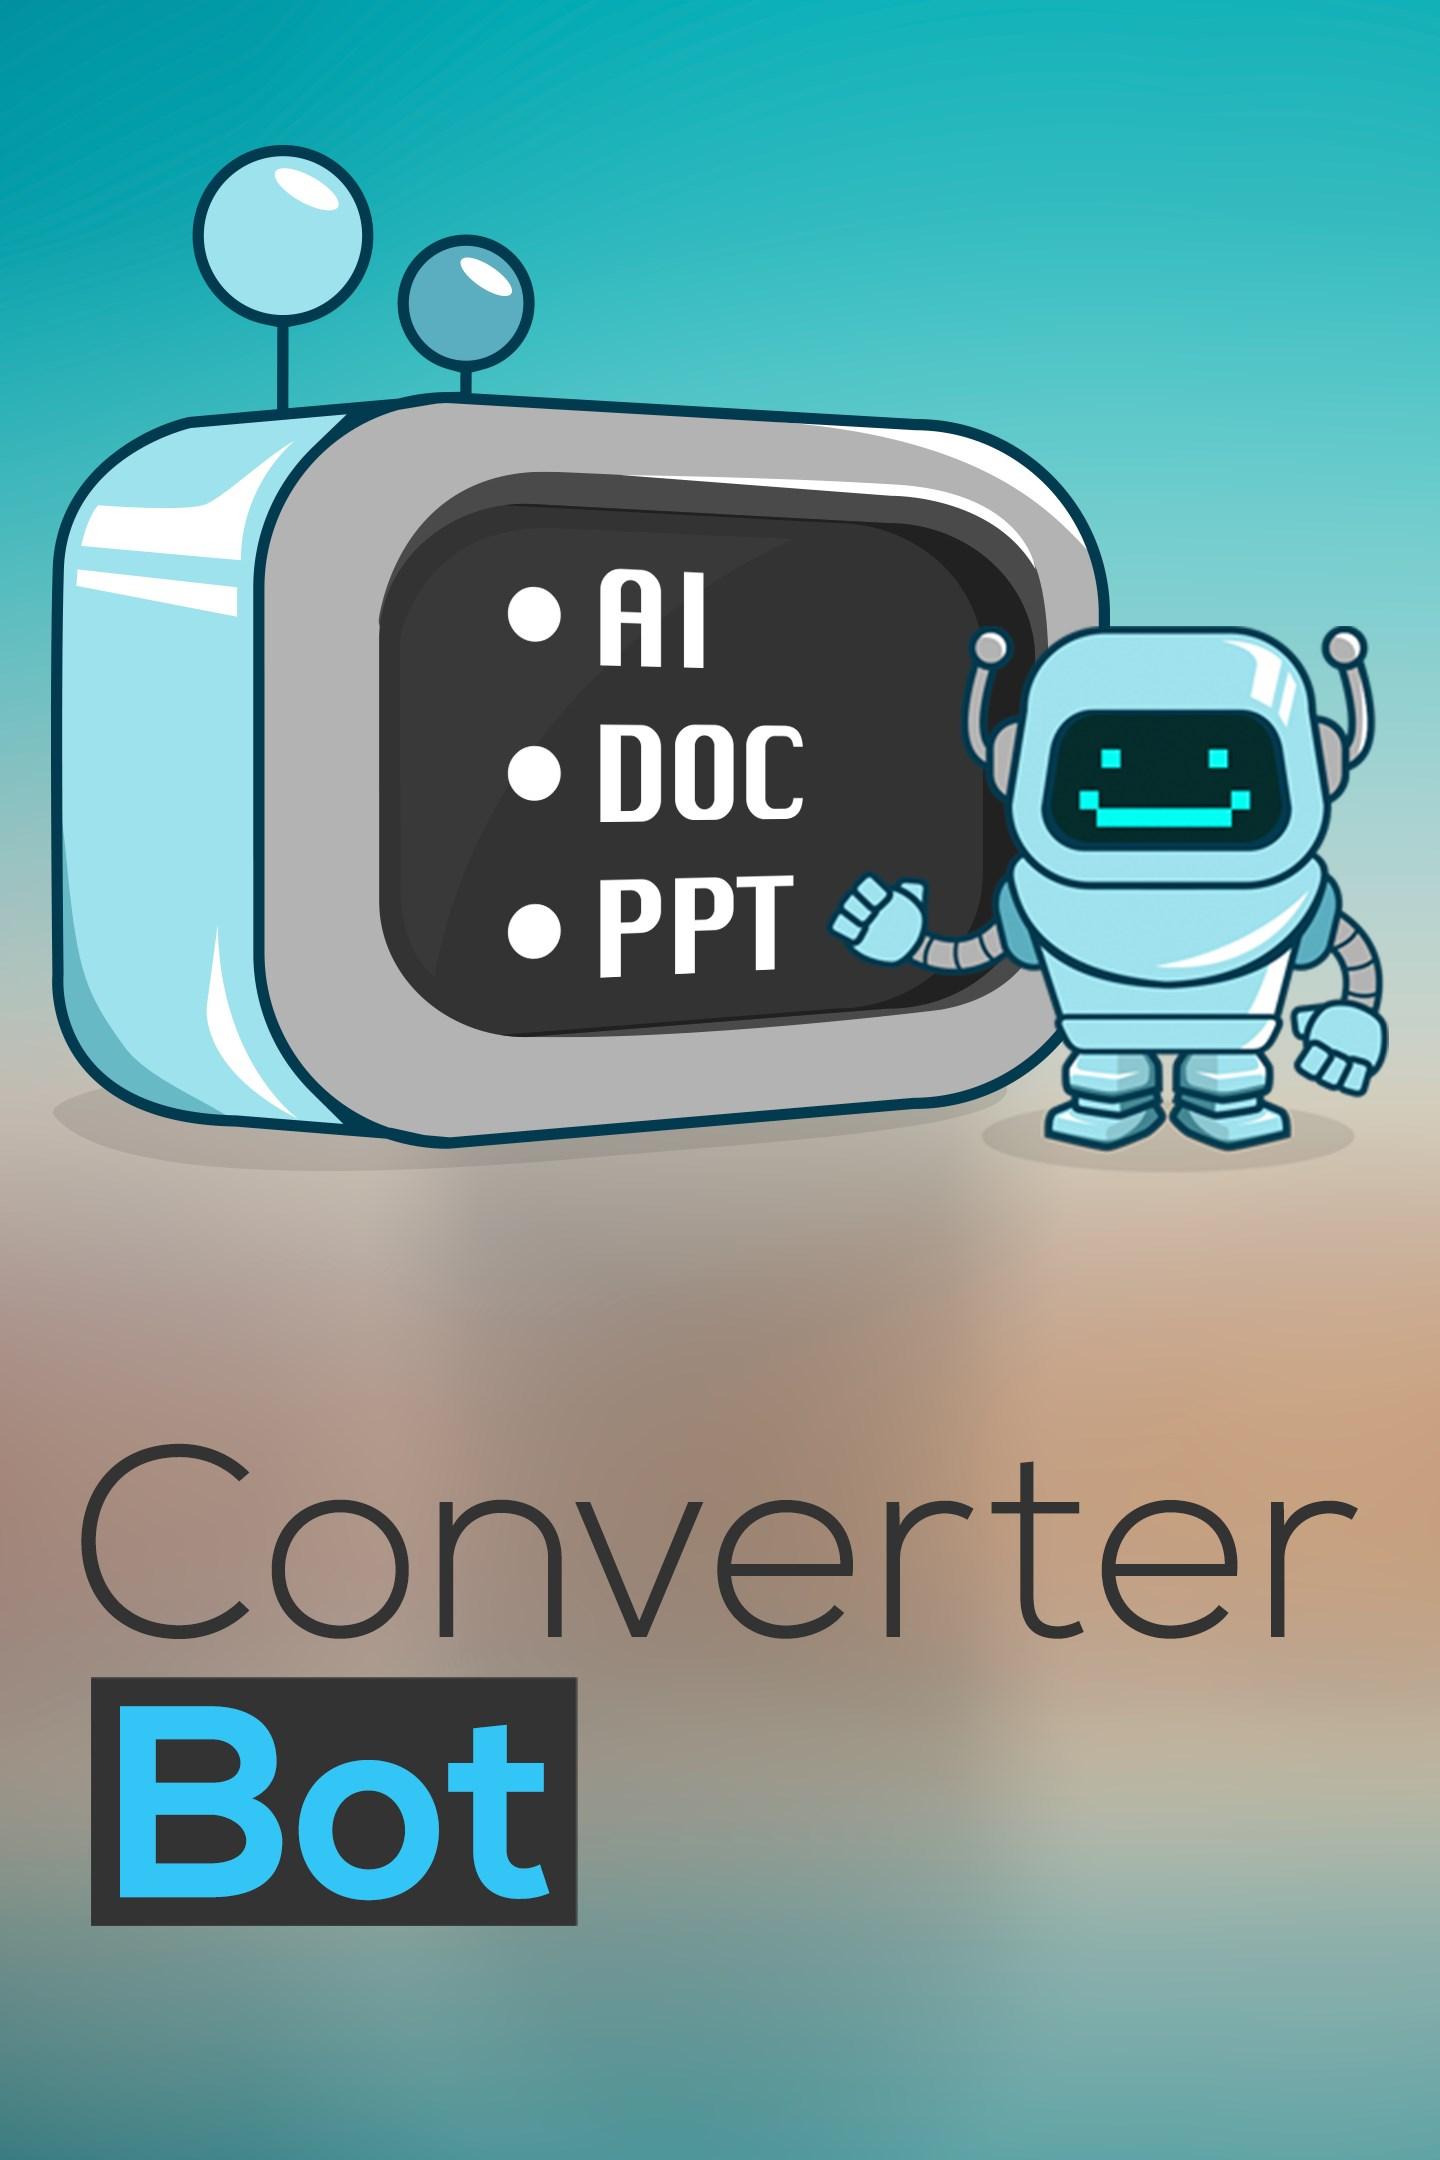 Get Converter Bot - Microsoft Store